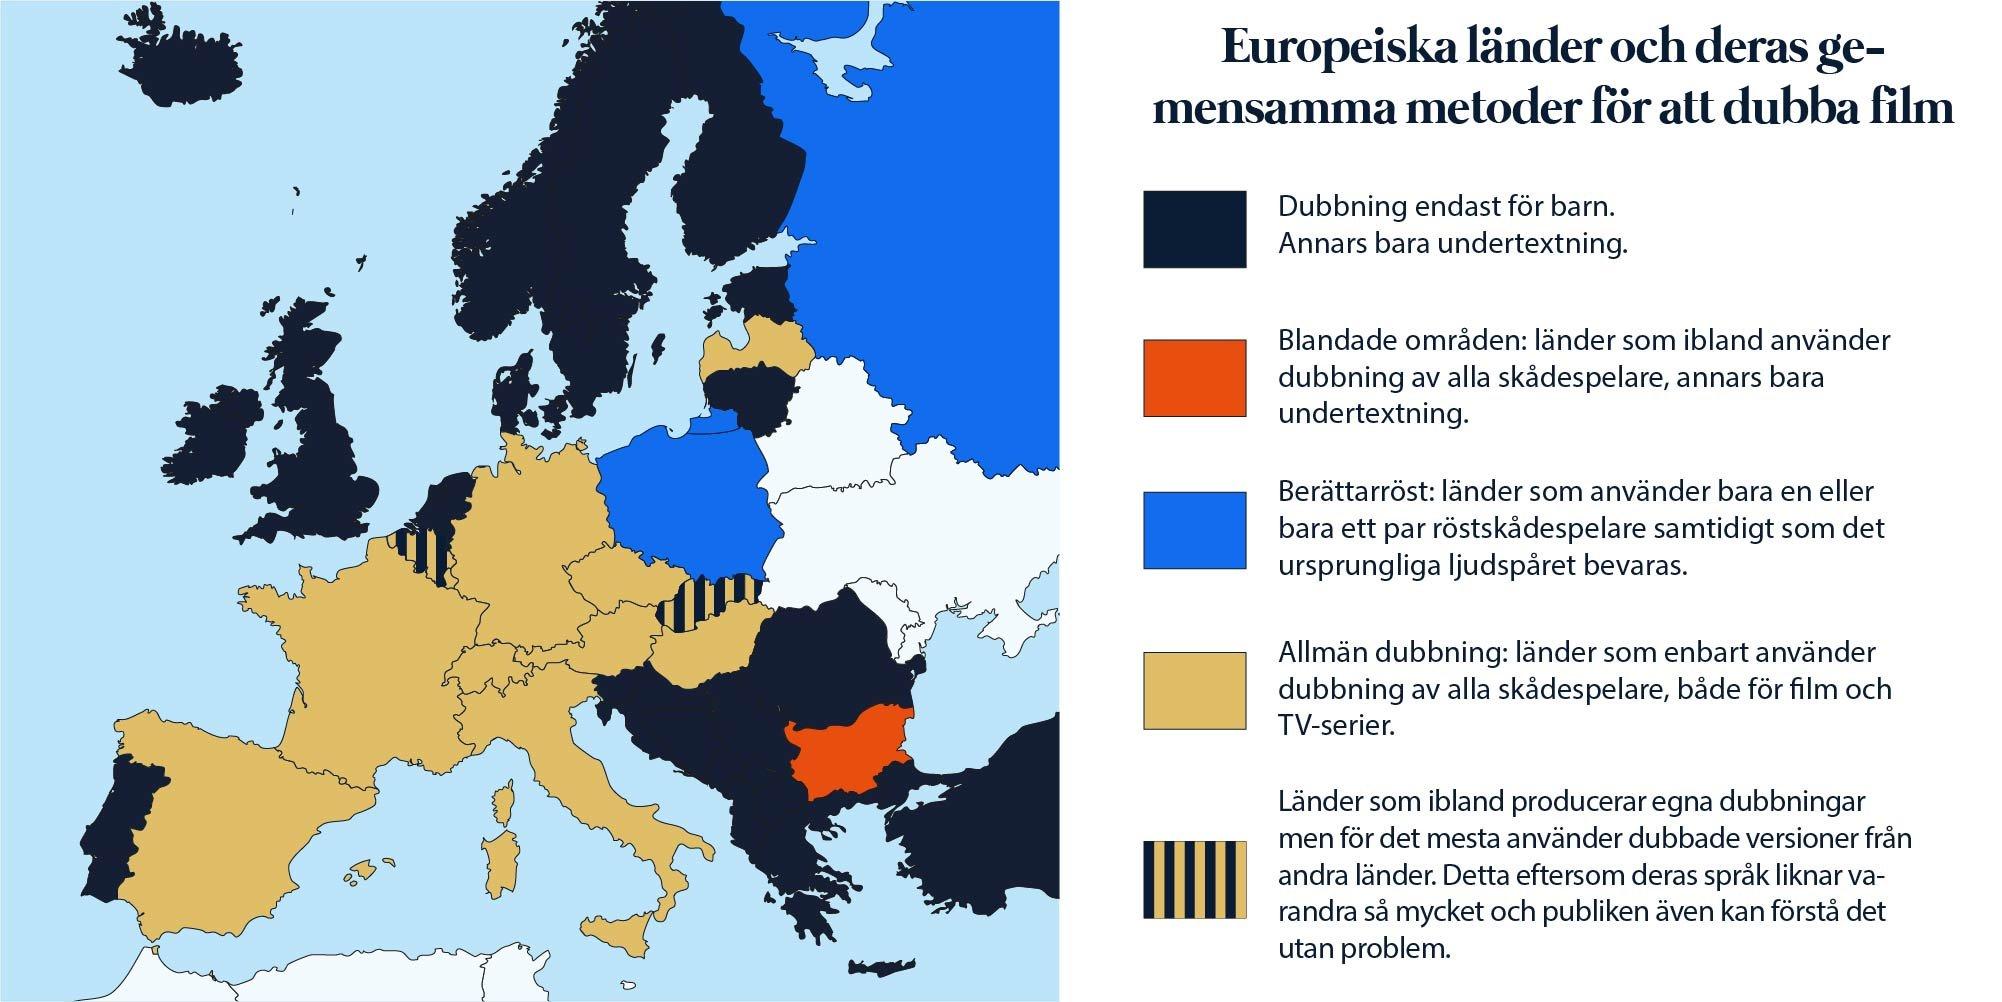 European-countries-dubbing-landscape-SV-v3